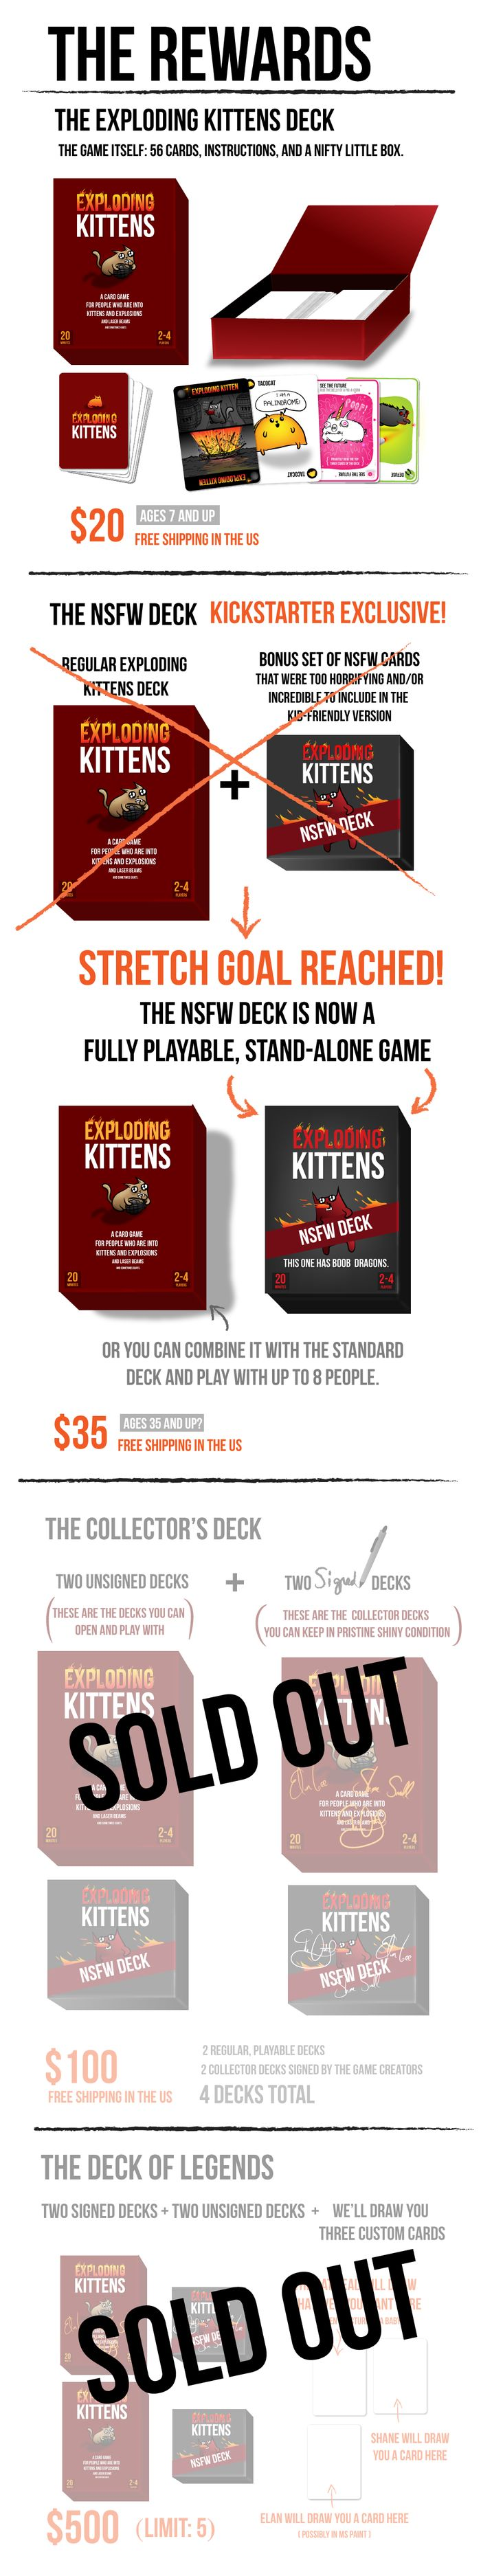 Exploding Kittens by Elan Lee — Kickstarter